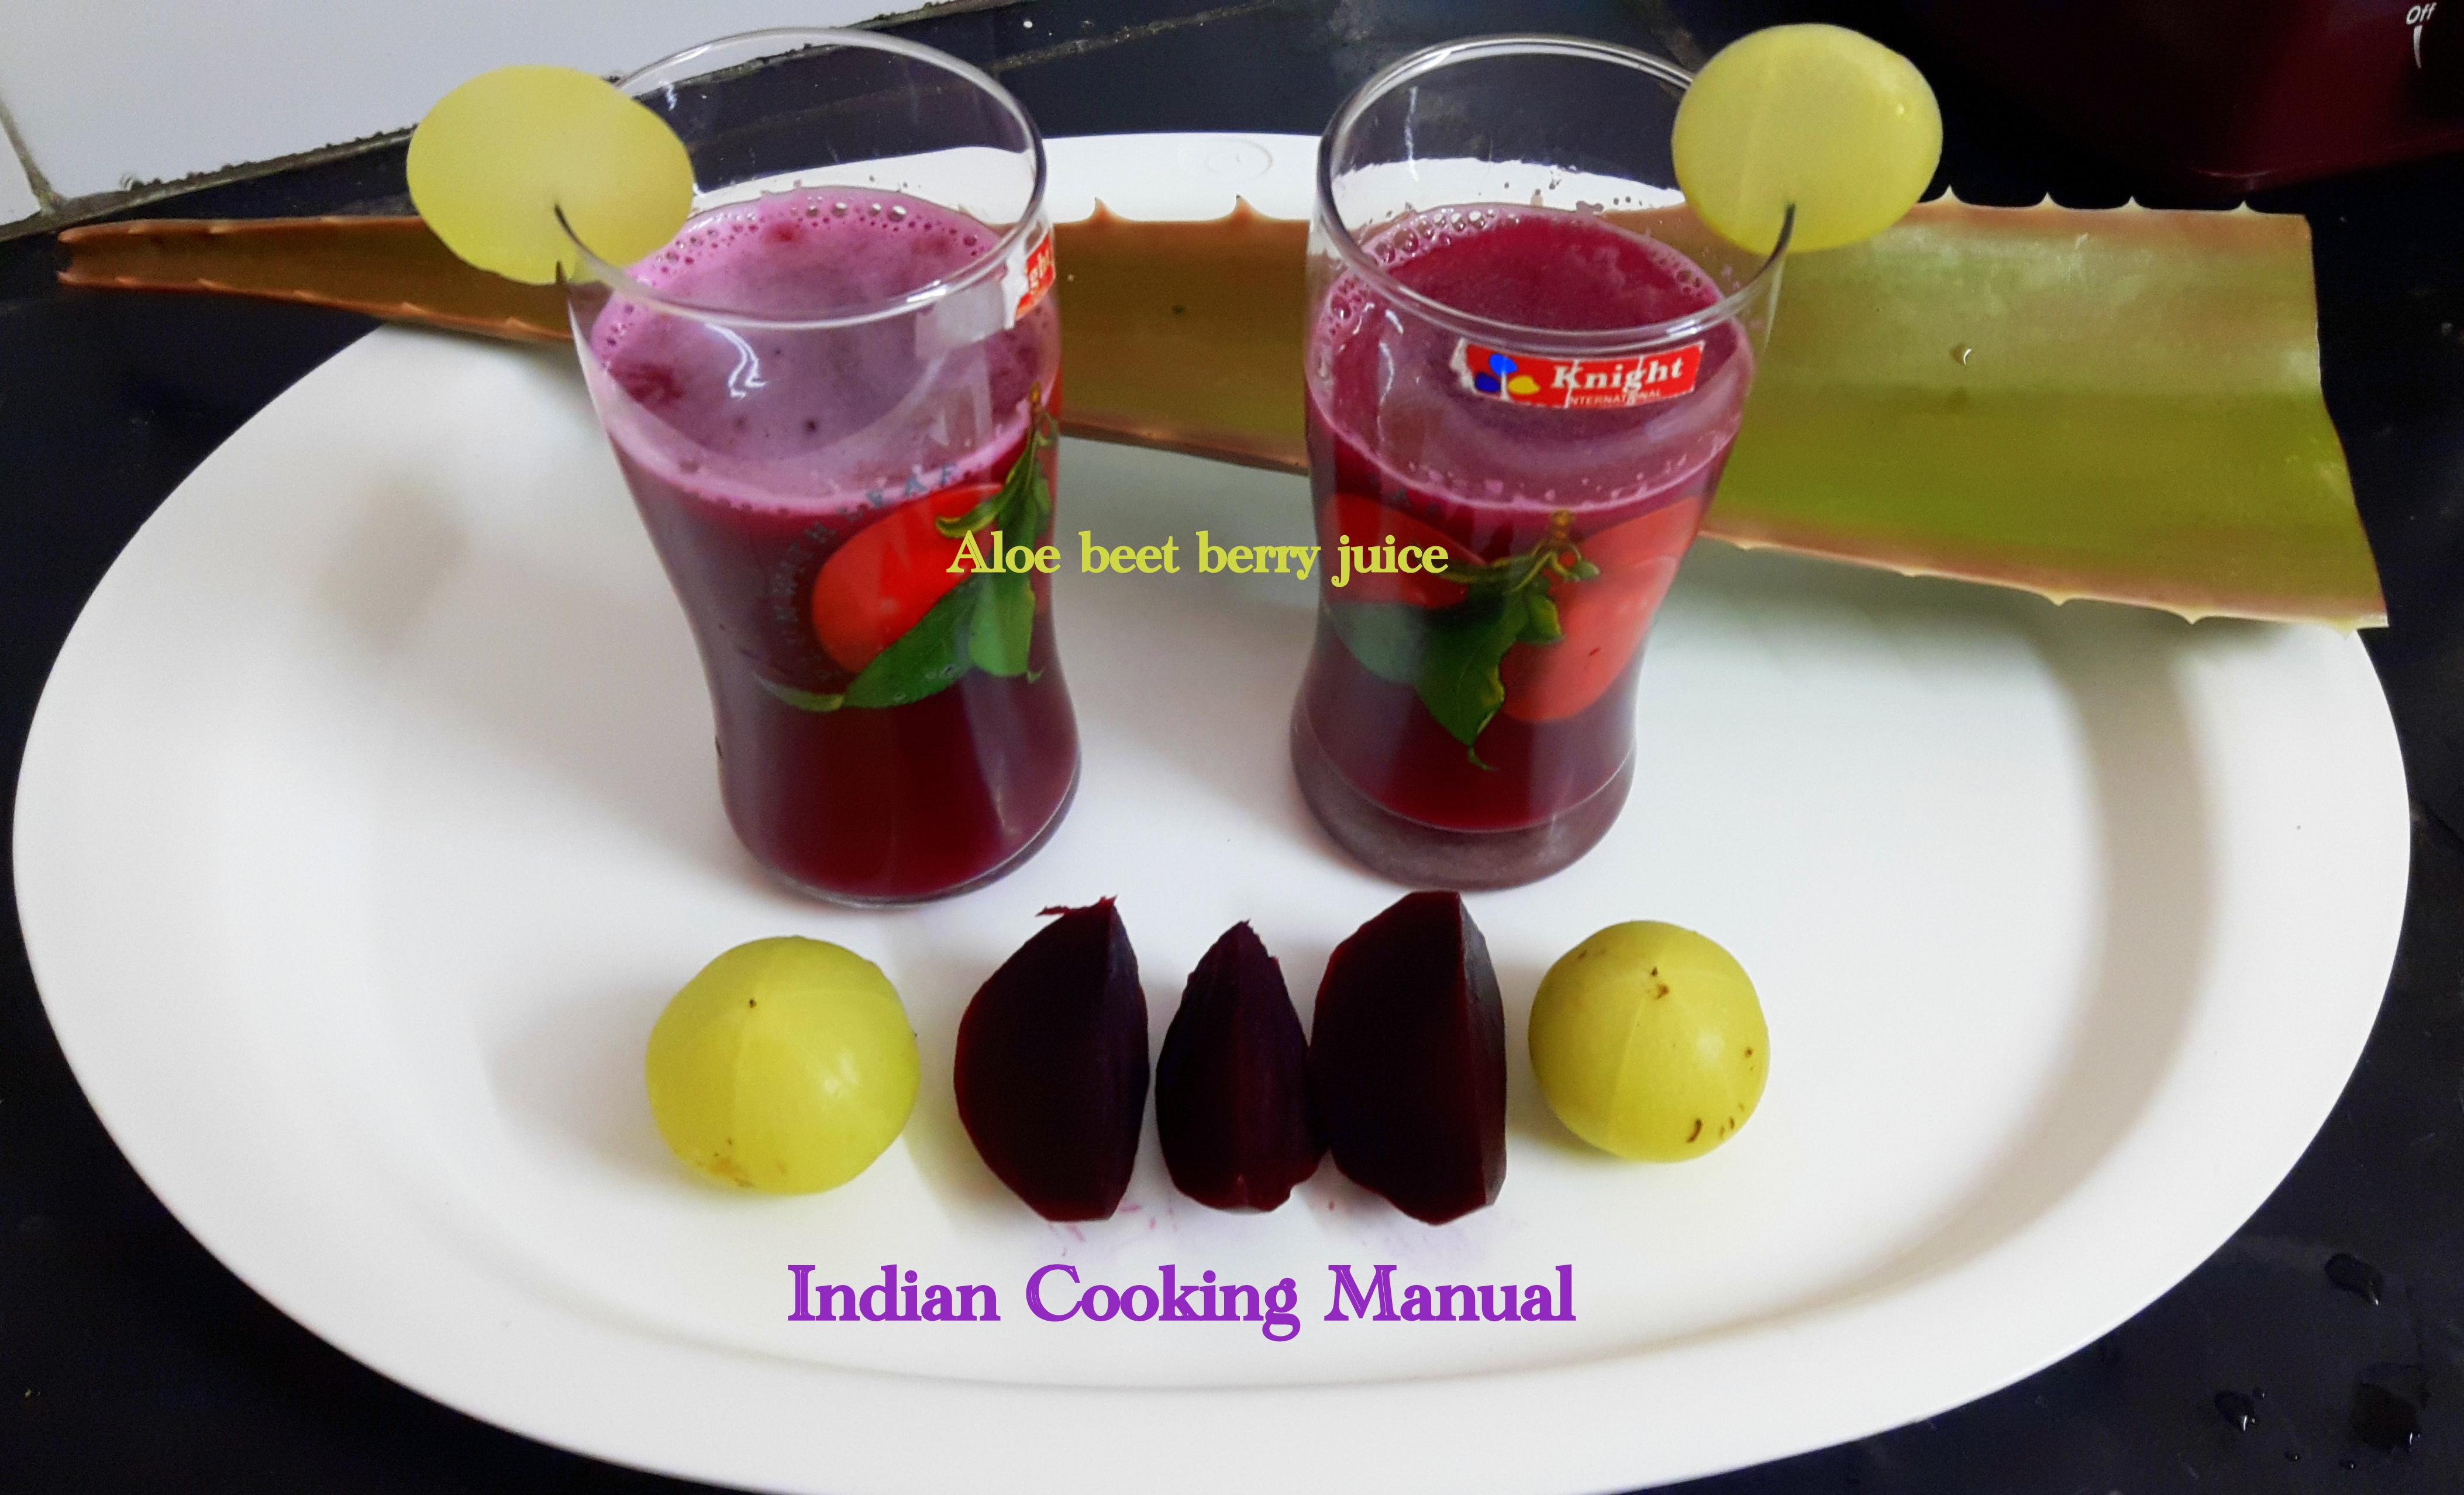 Aloe beet berry juice